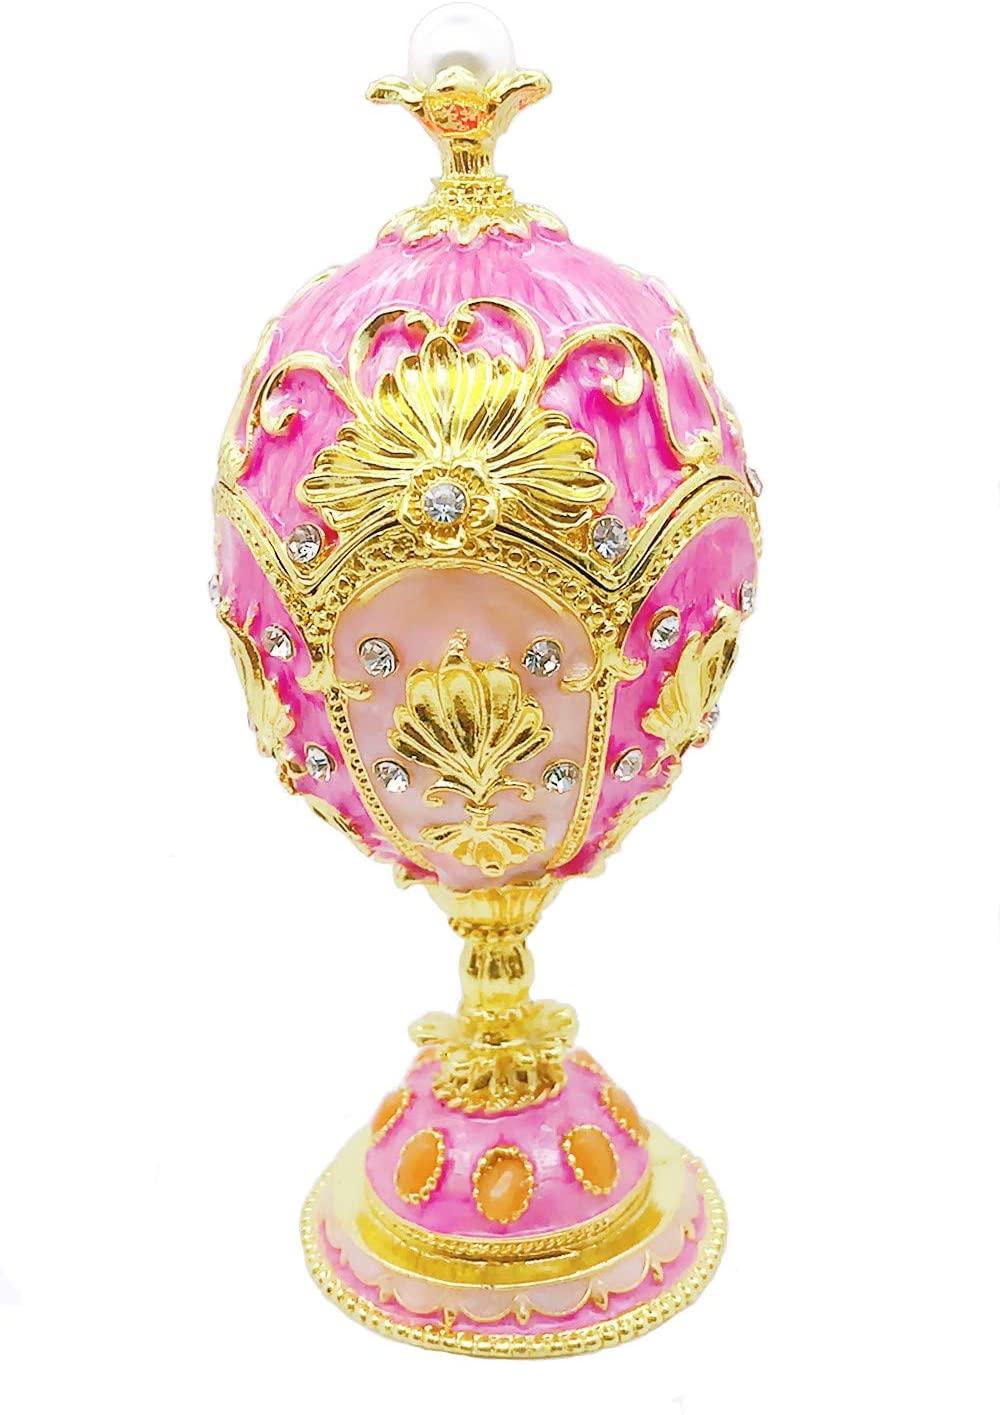 Gishima Hand Painted Enameled Faberge Egg Decorative Hinged Jewelry Trinket Box for Home Decor or Unique Gift